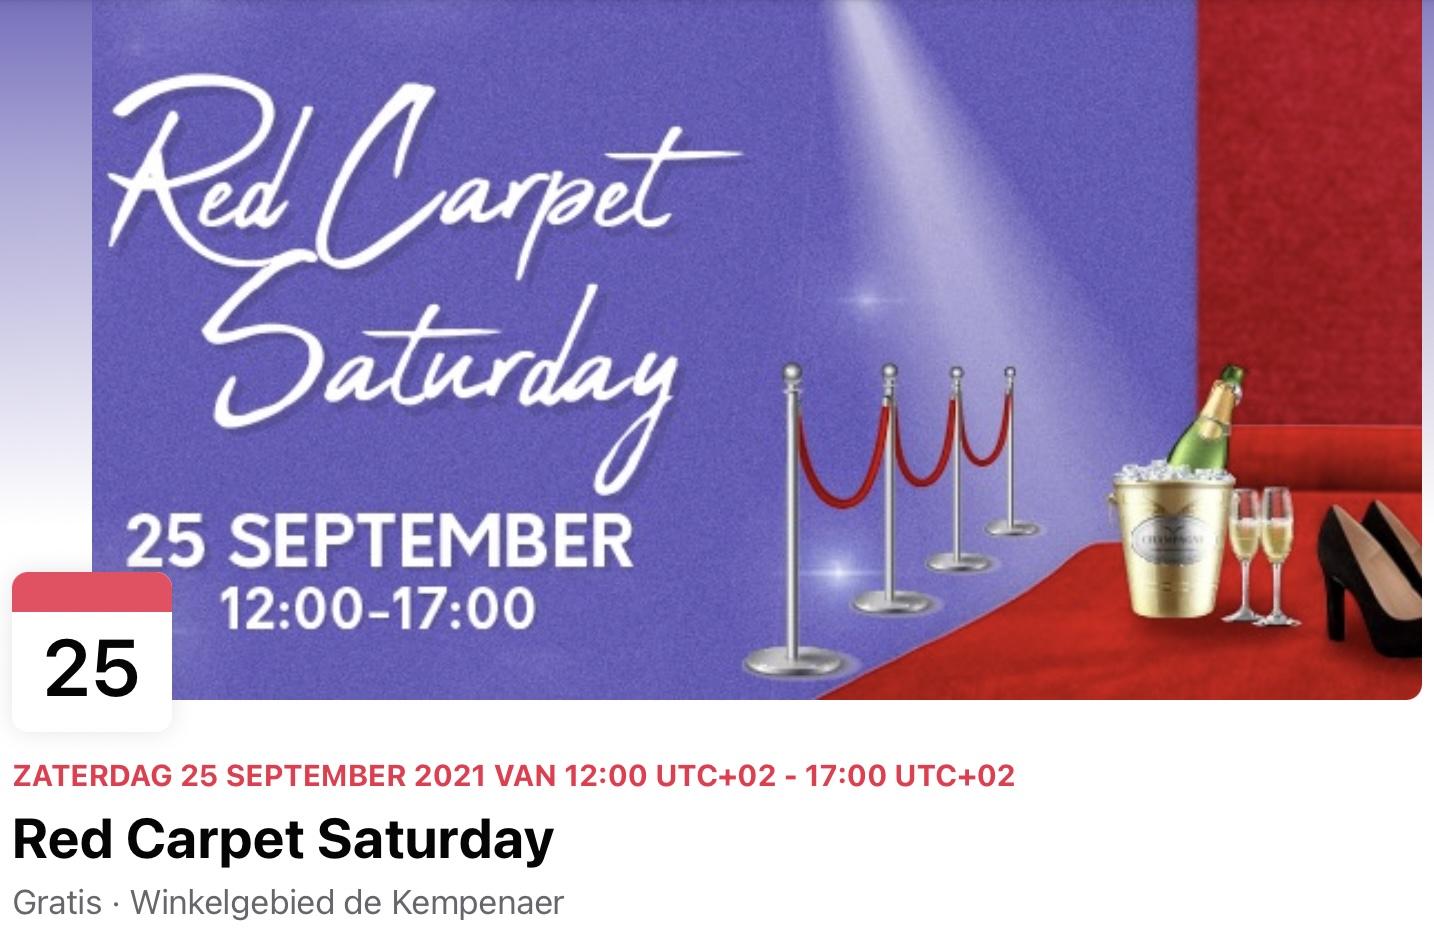 Red Carpet Saturday in De Kempenaer